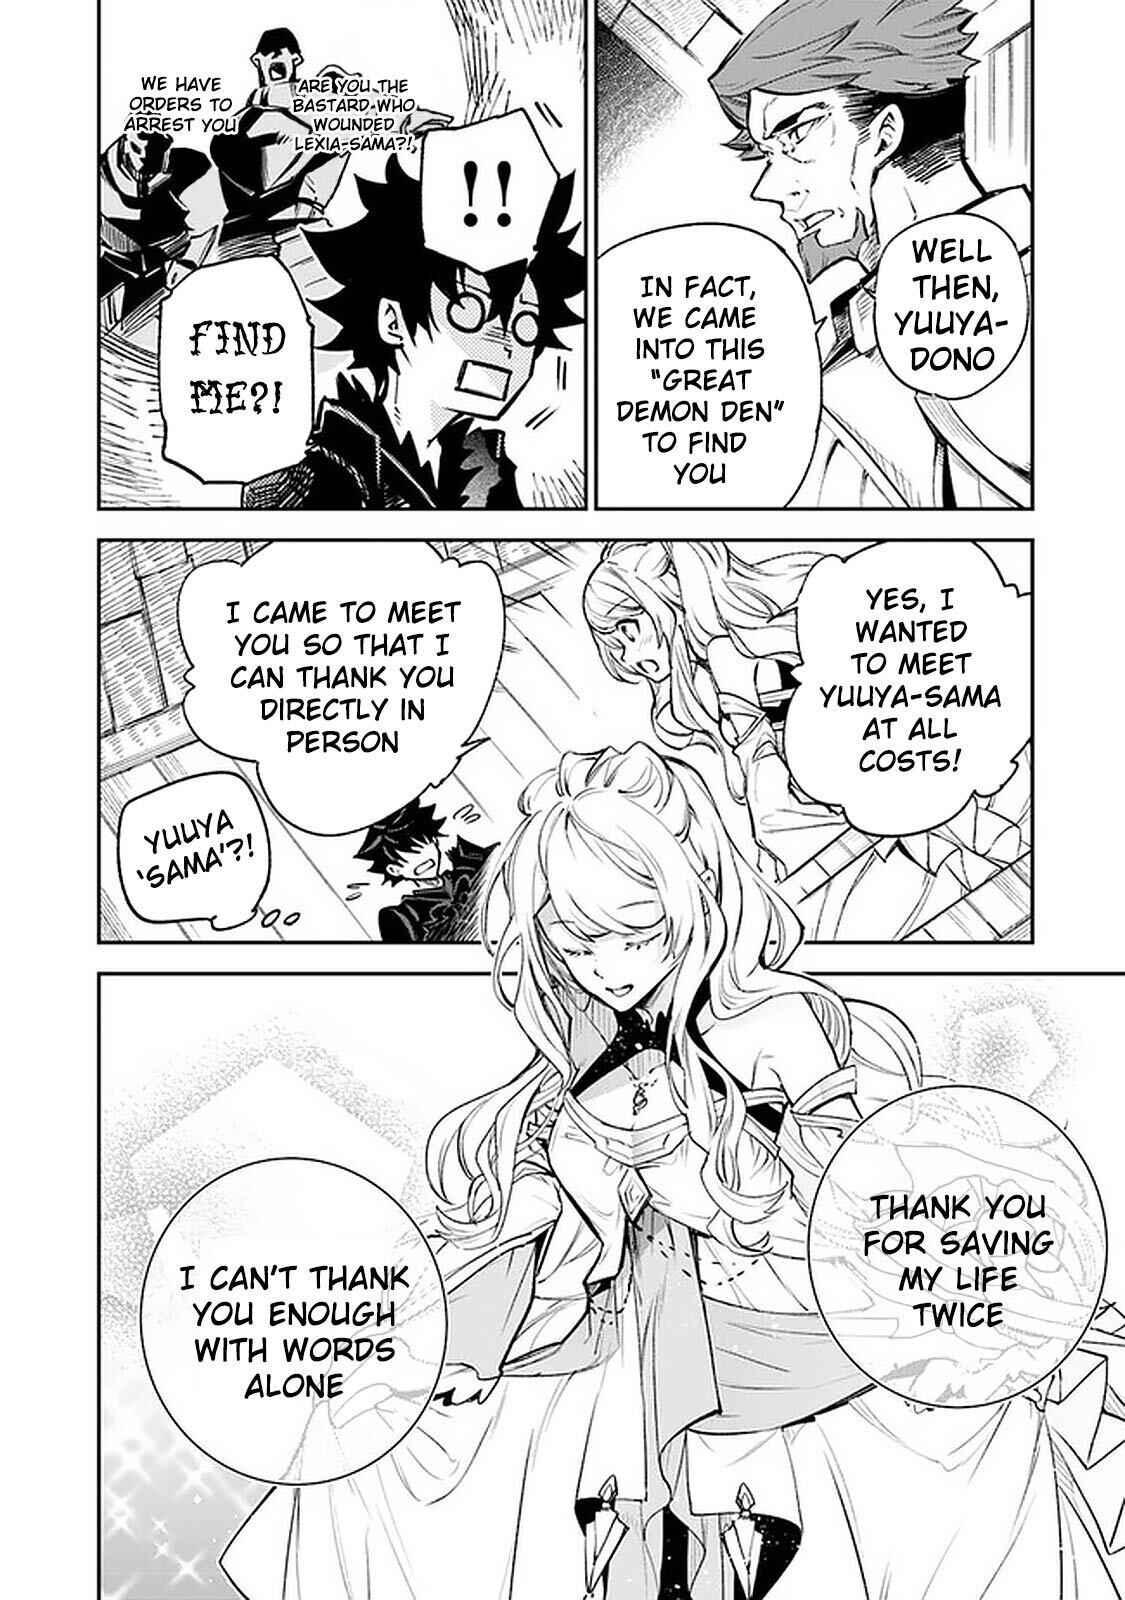 Isekai de Cheat Skill wo Te ni Shita Ore wa, Genjitsu Sekai wo mo Musou Suru ~Level Up wa Jinsei wo Kaeta~ - chapter 9-1-eng-li